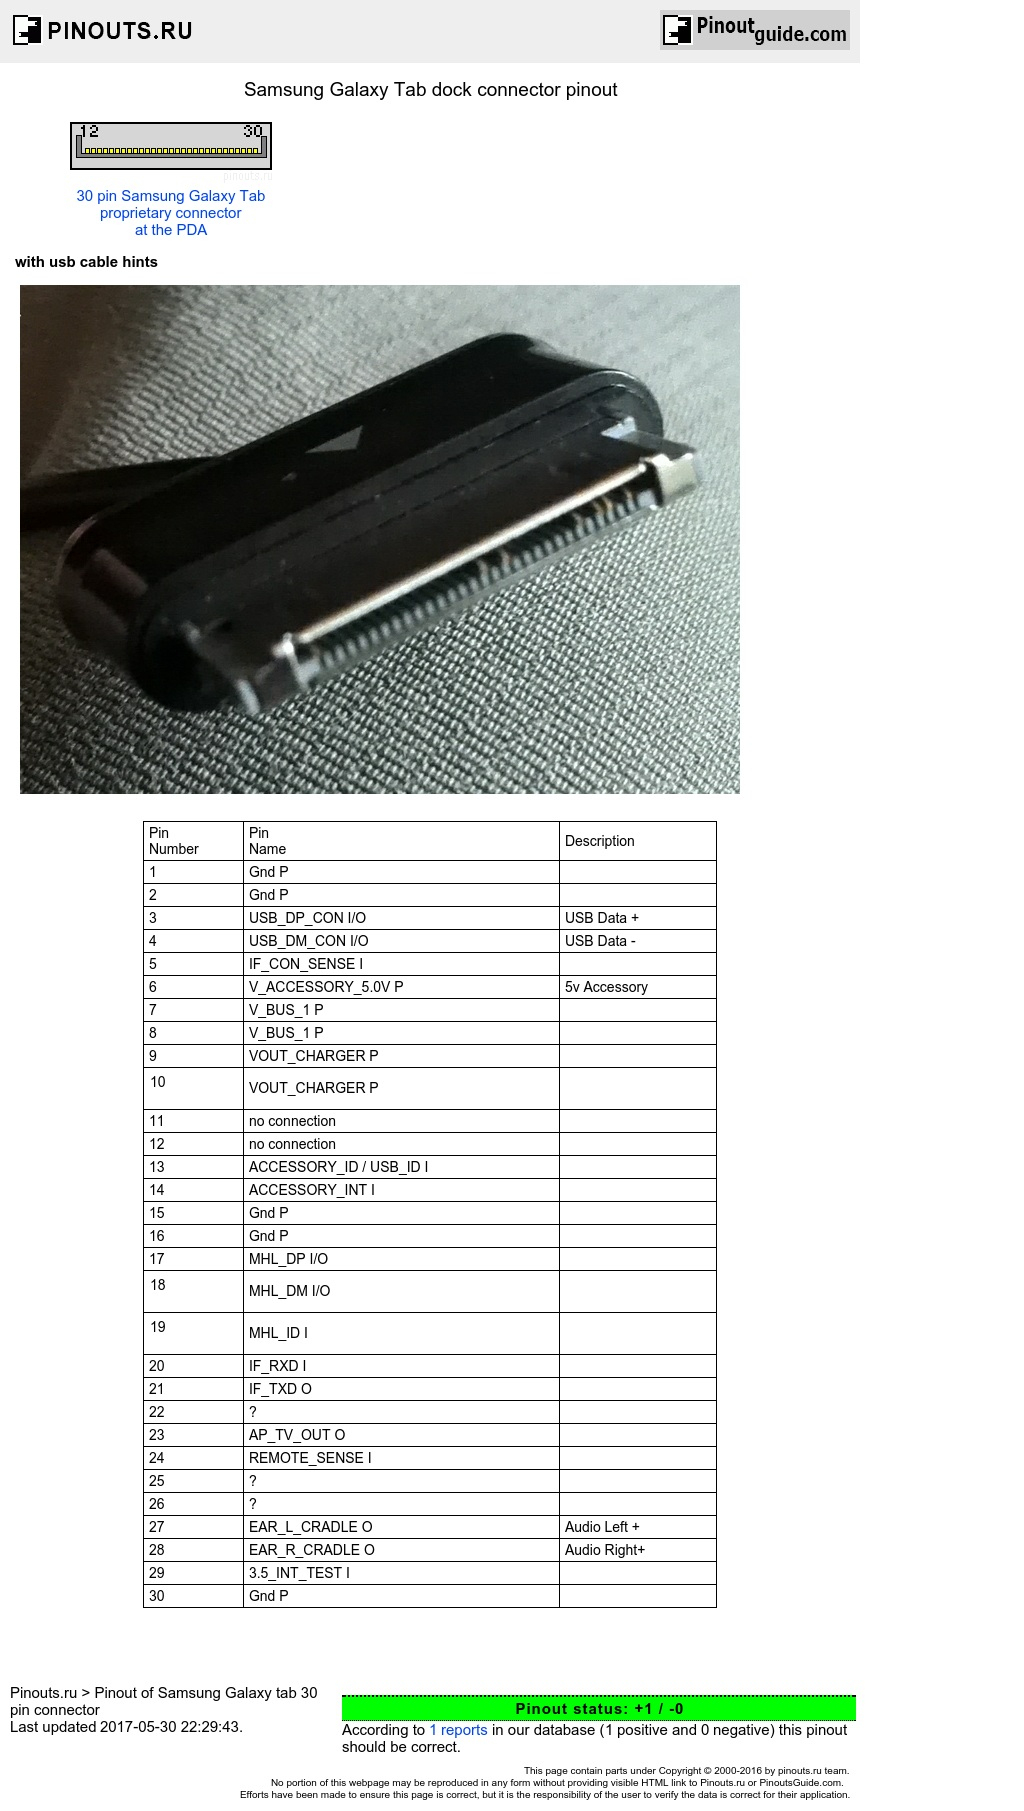 Samsung Galaxy Tab Dock Connector Pinout Diagram @ Pinoutguide - Samsung Galaxy Tab 2 Charger Wiring Diagram